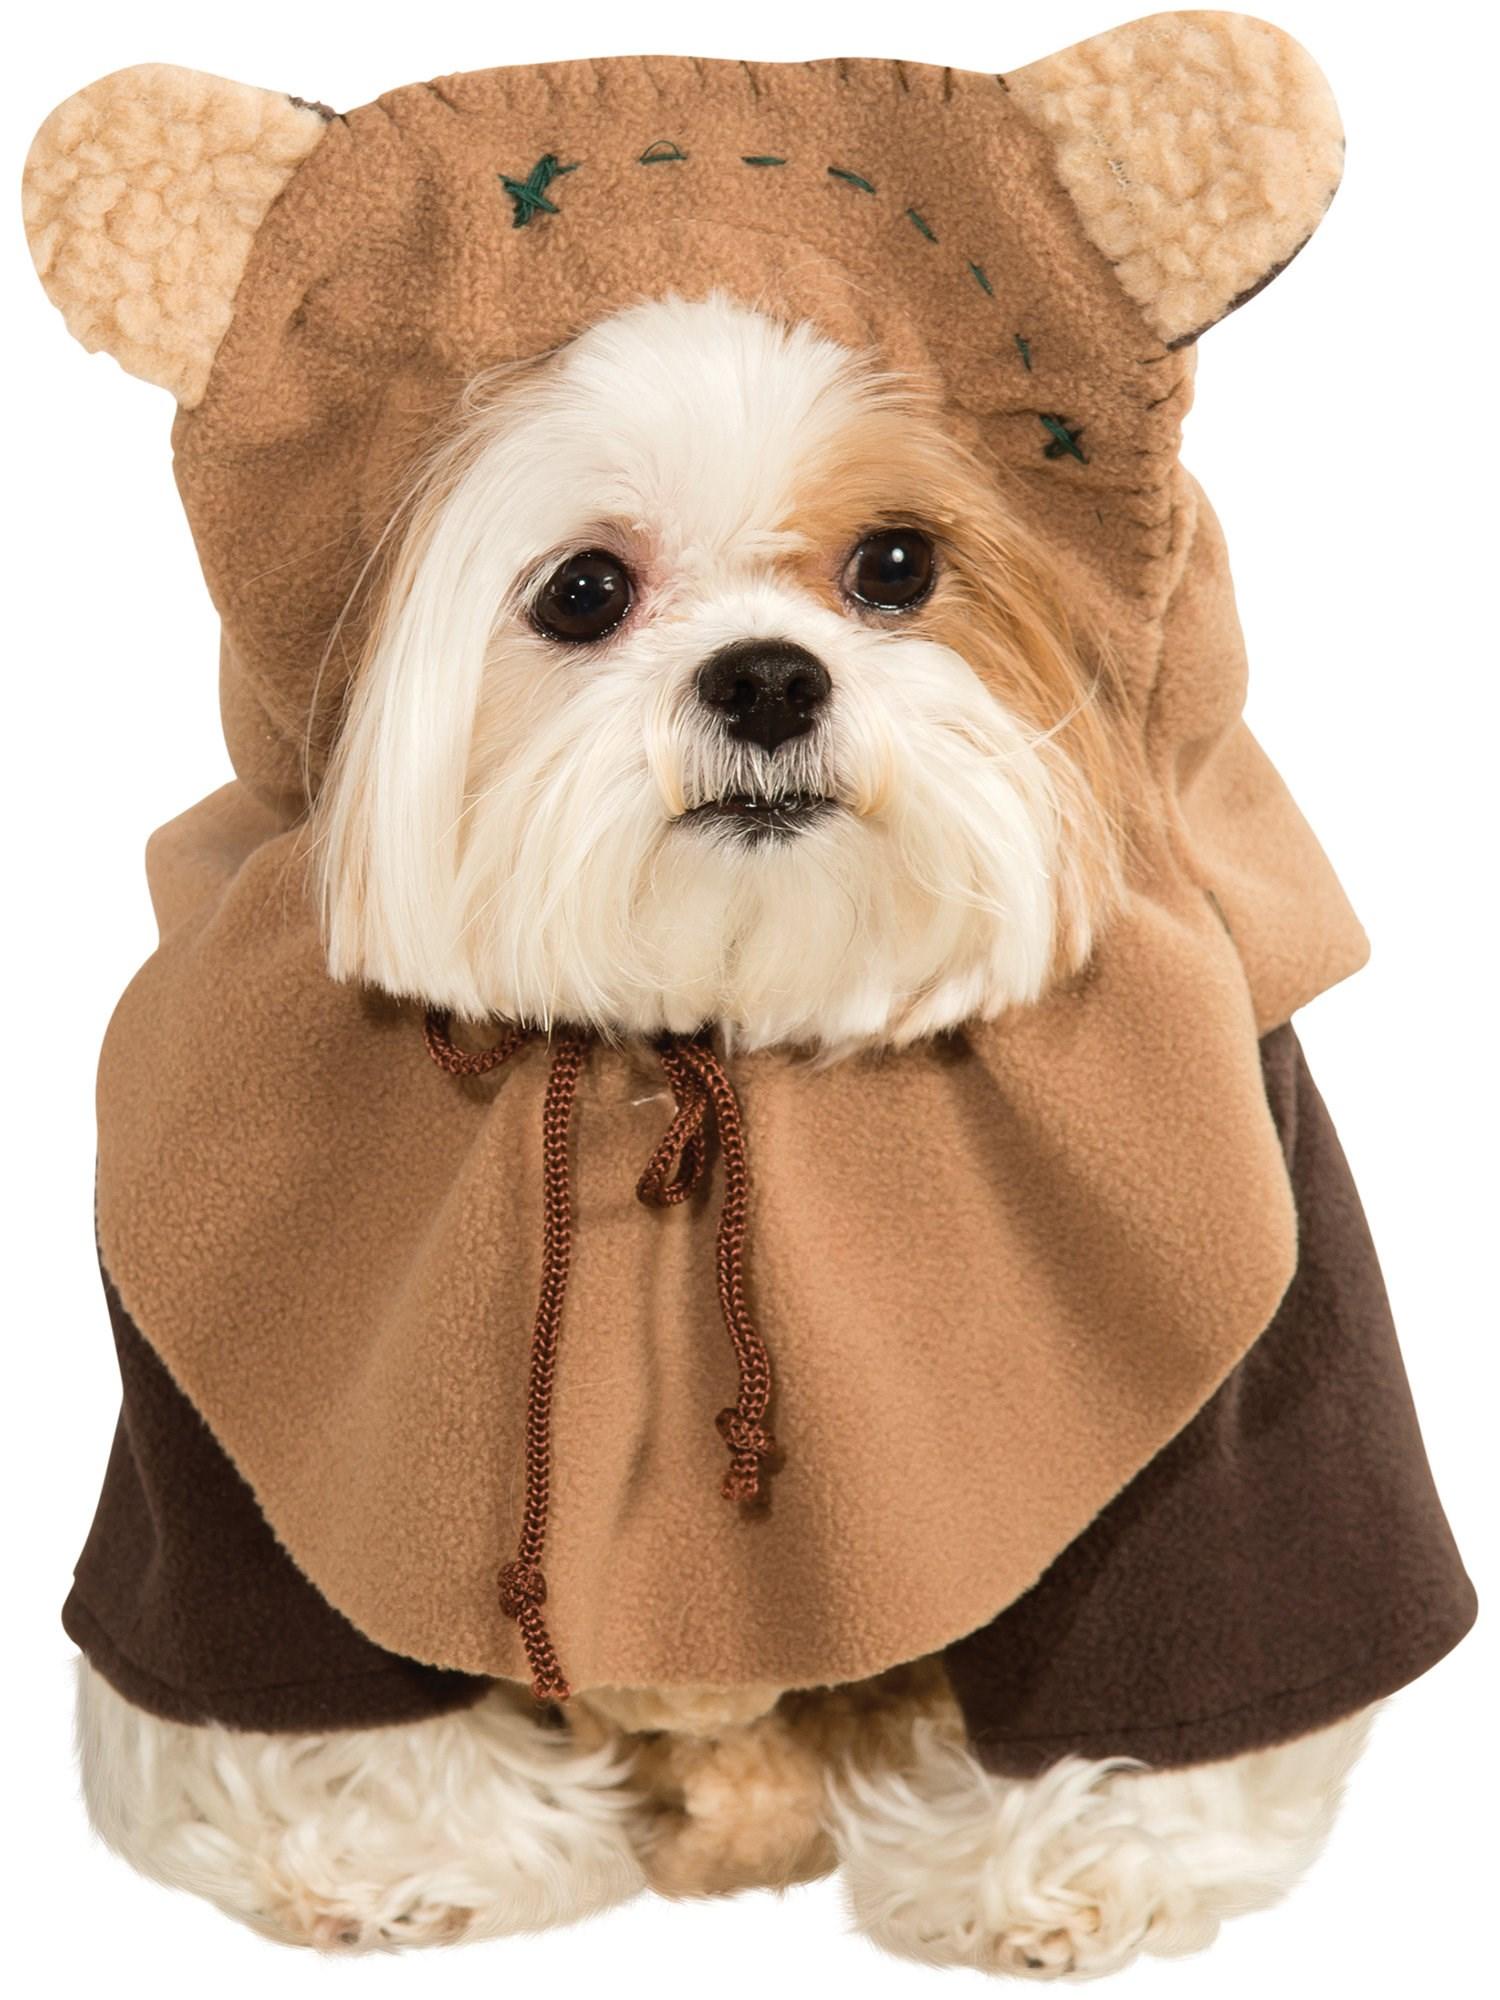 Star Wars – Ewok Dog Costume